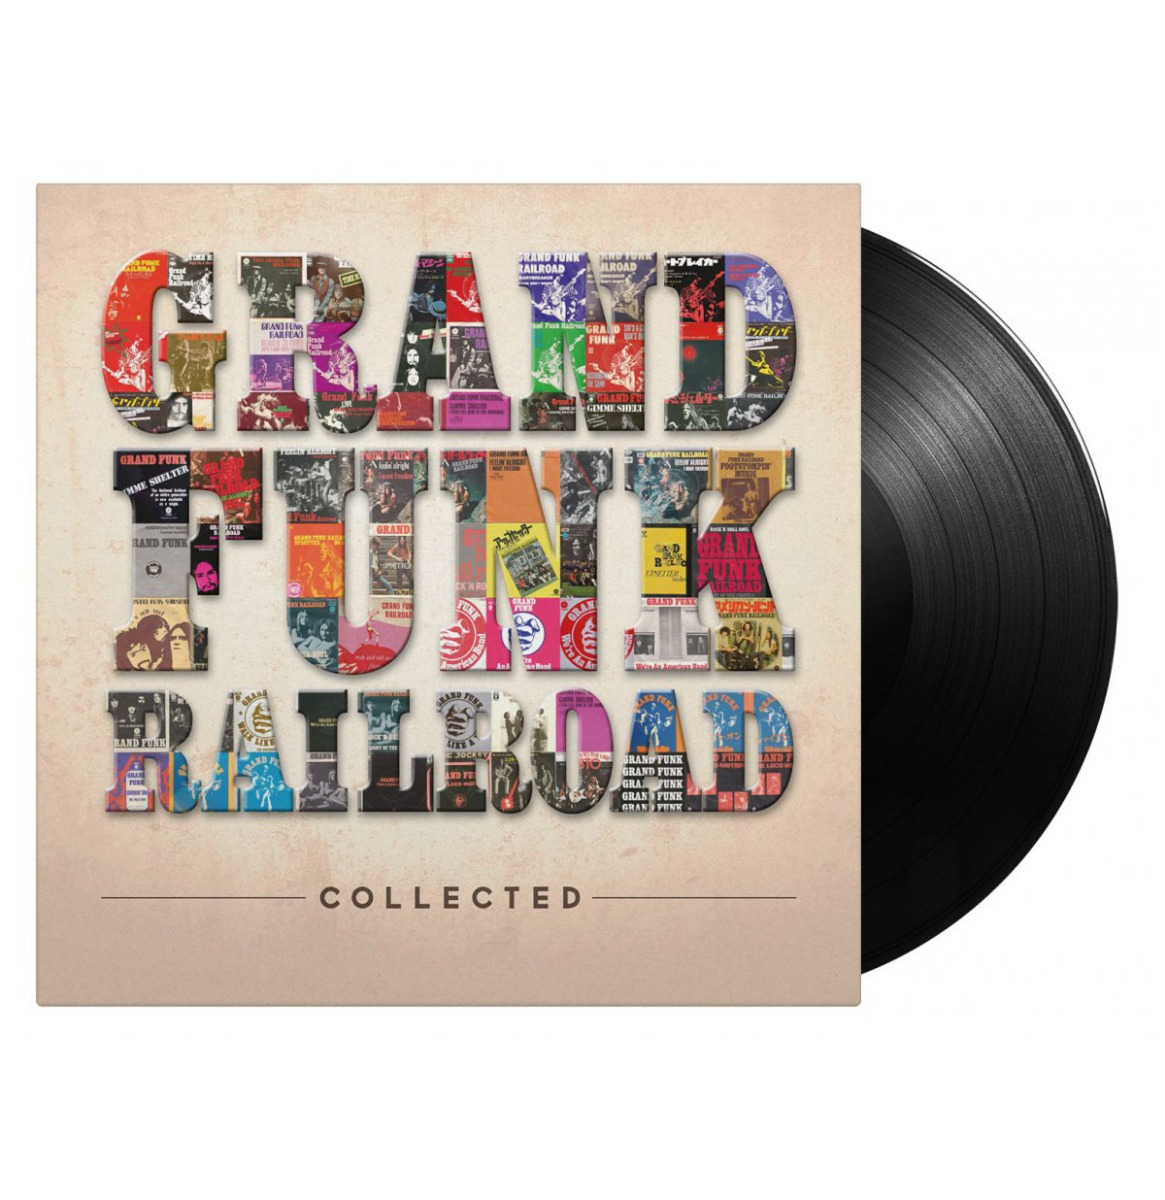 Grand Funk Railroad - Collected 2LP